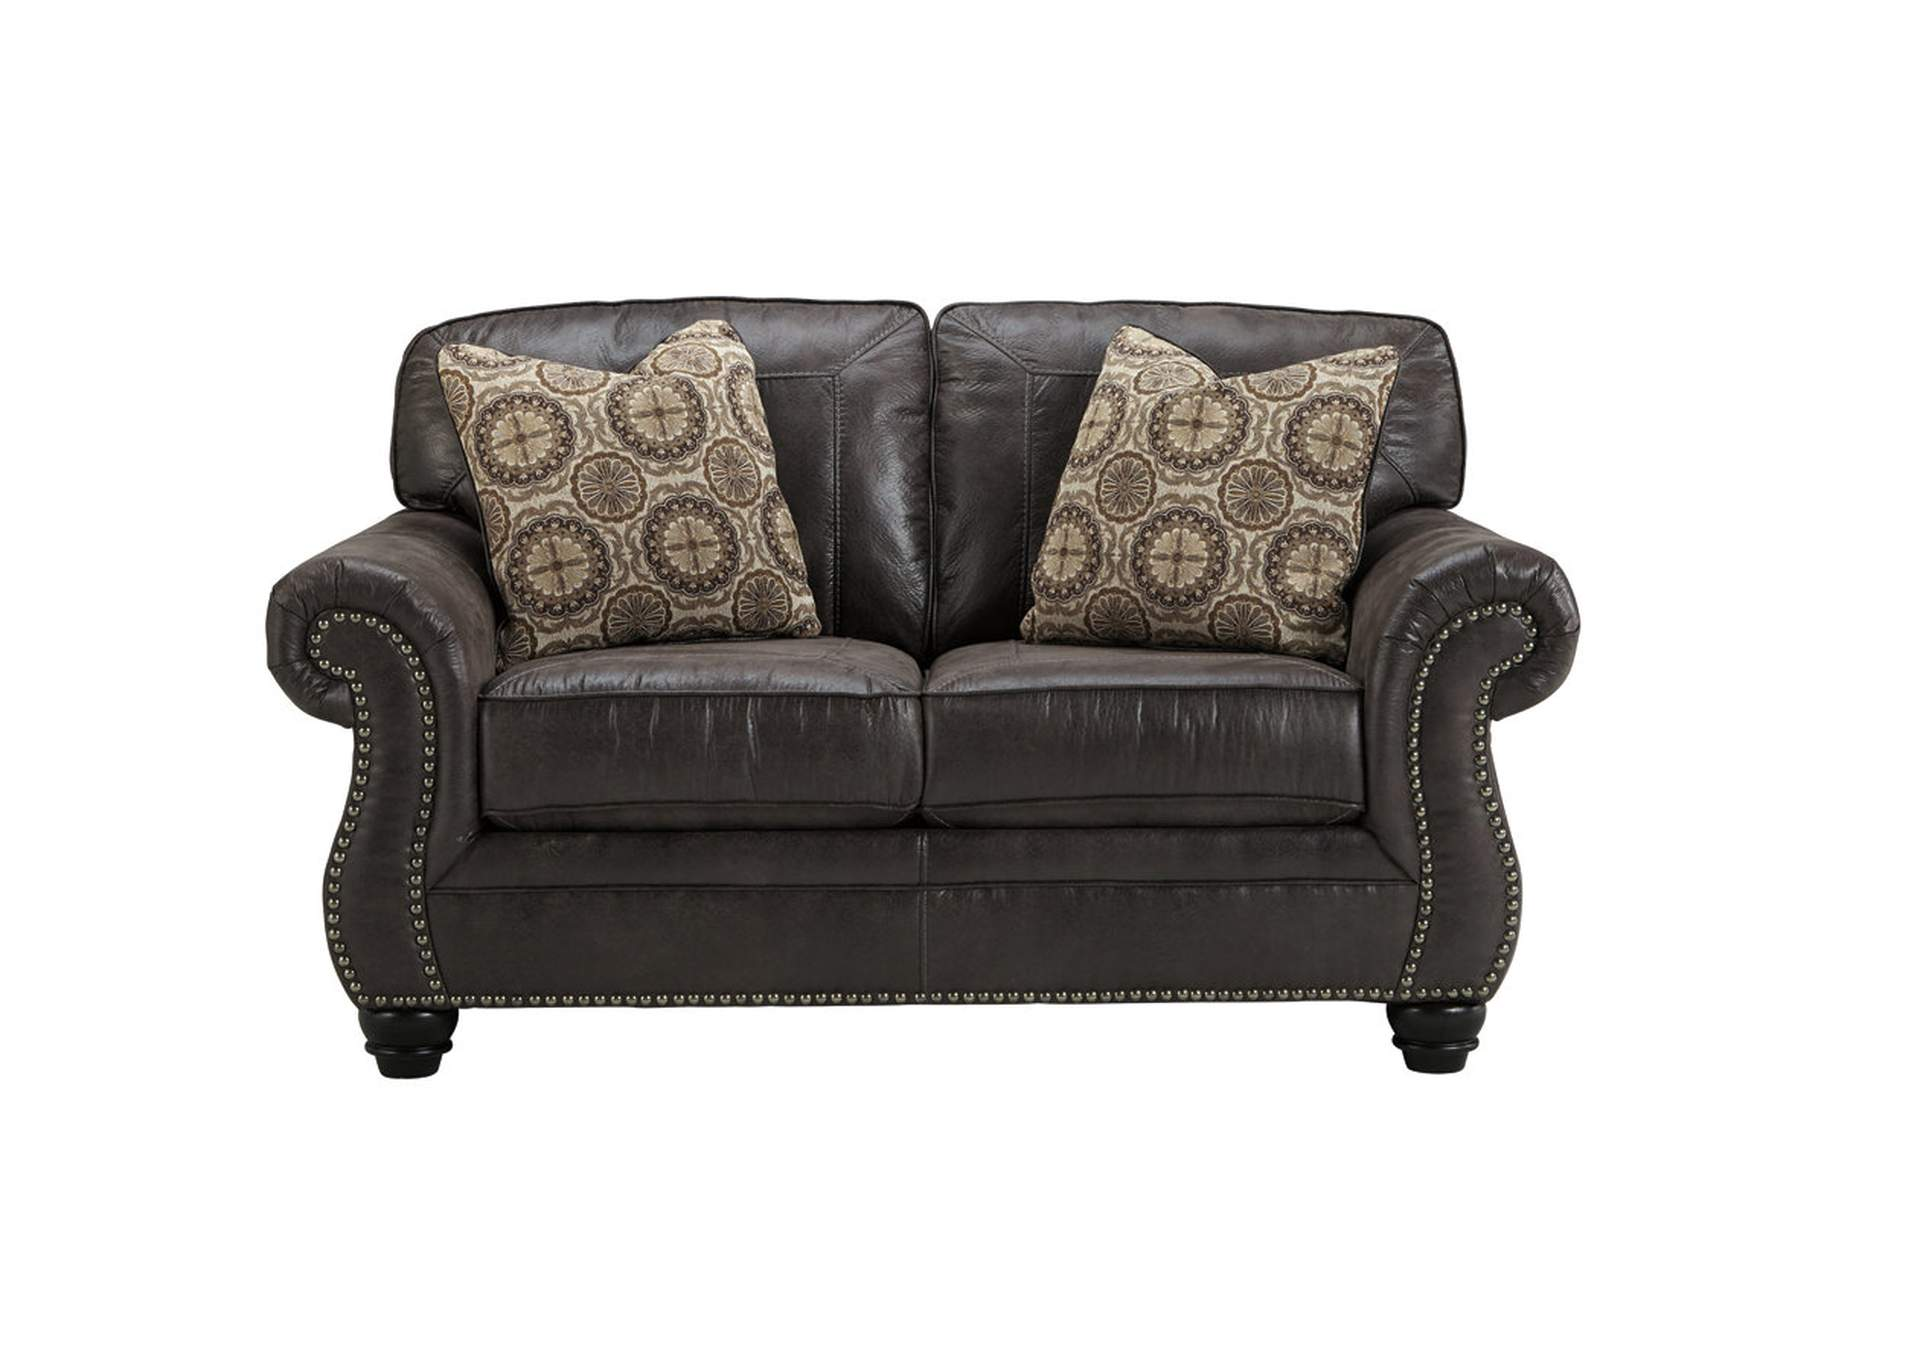 Furniture outlet chicago llc chicago il breville for Furniture 60618